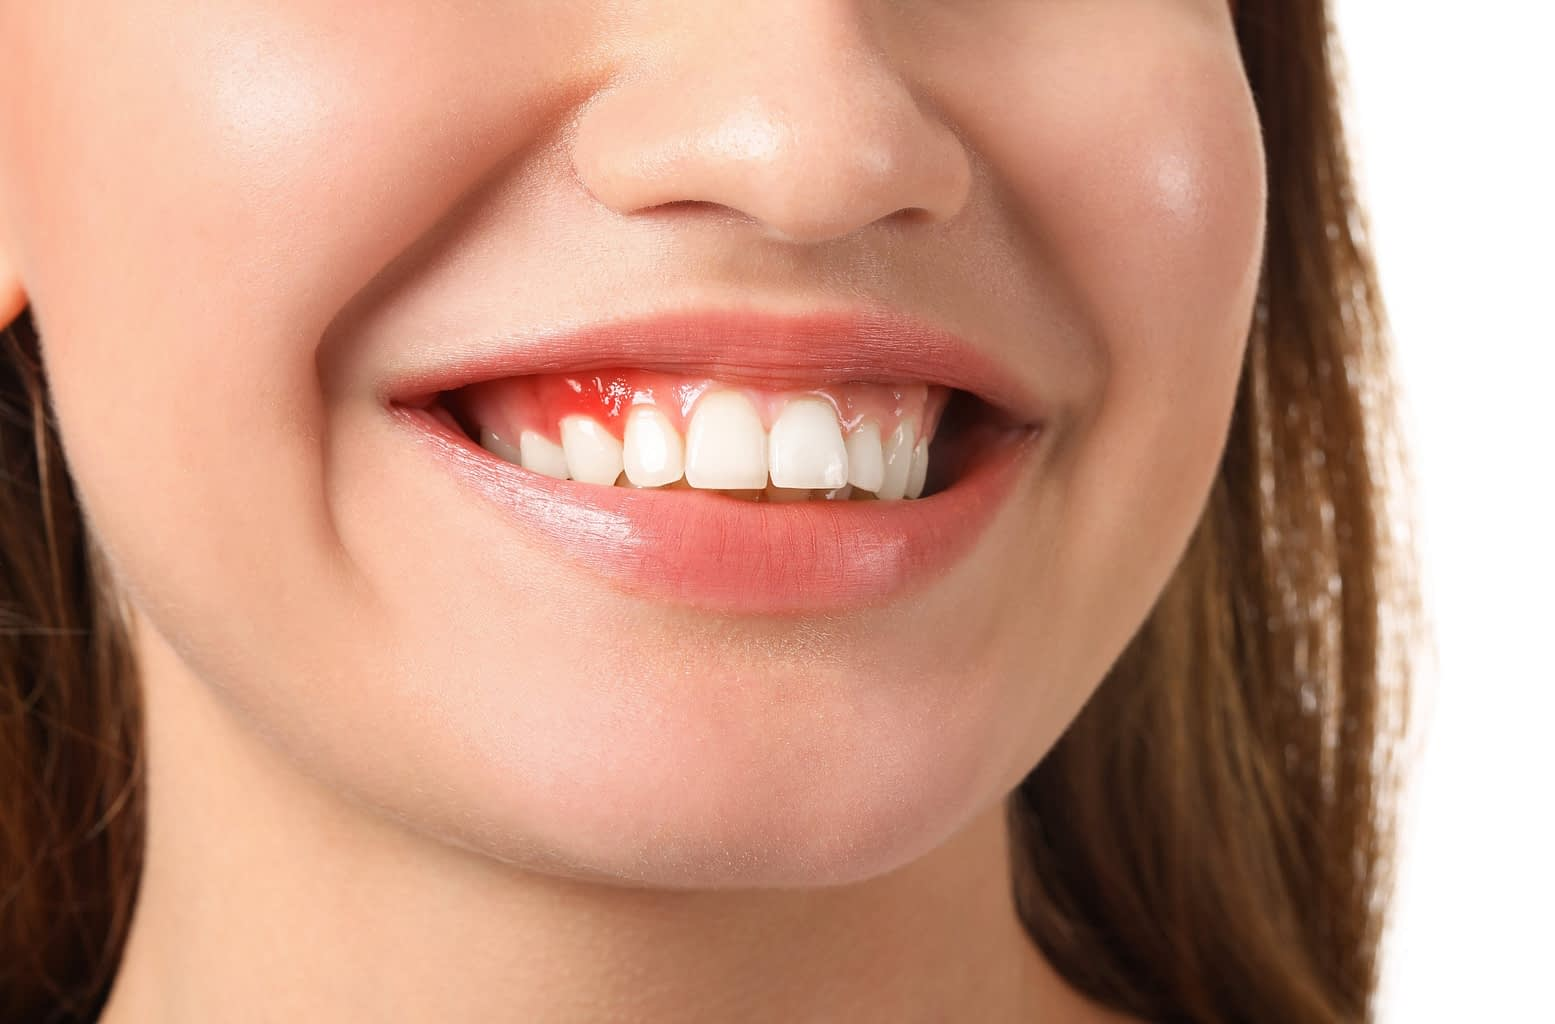 initial-signs-of-gum-disease